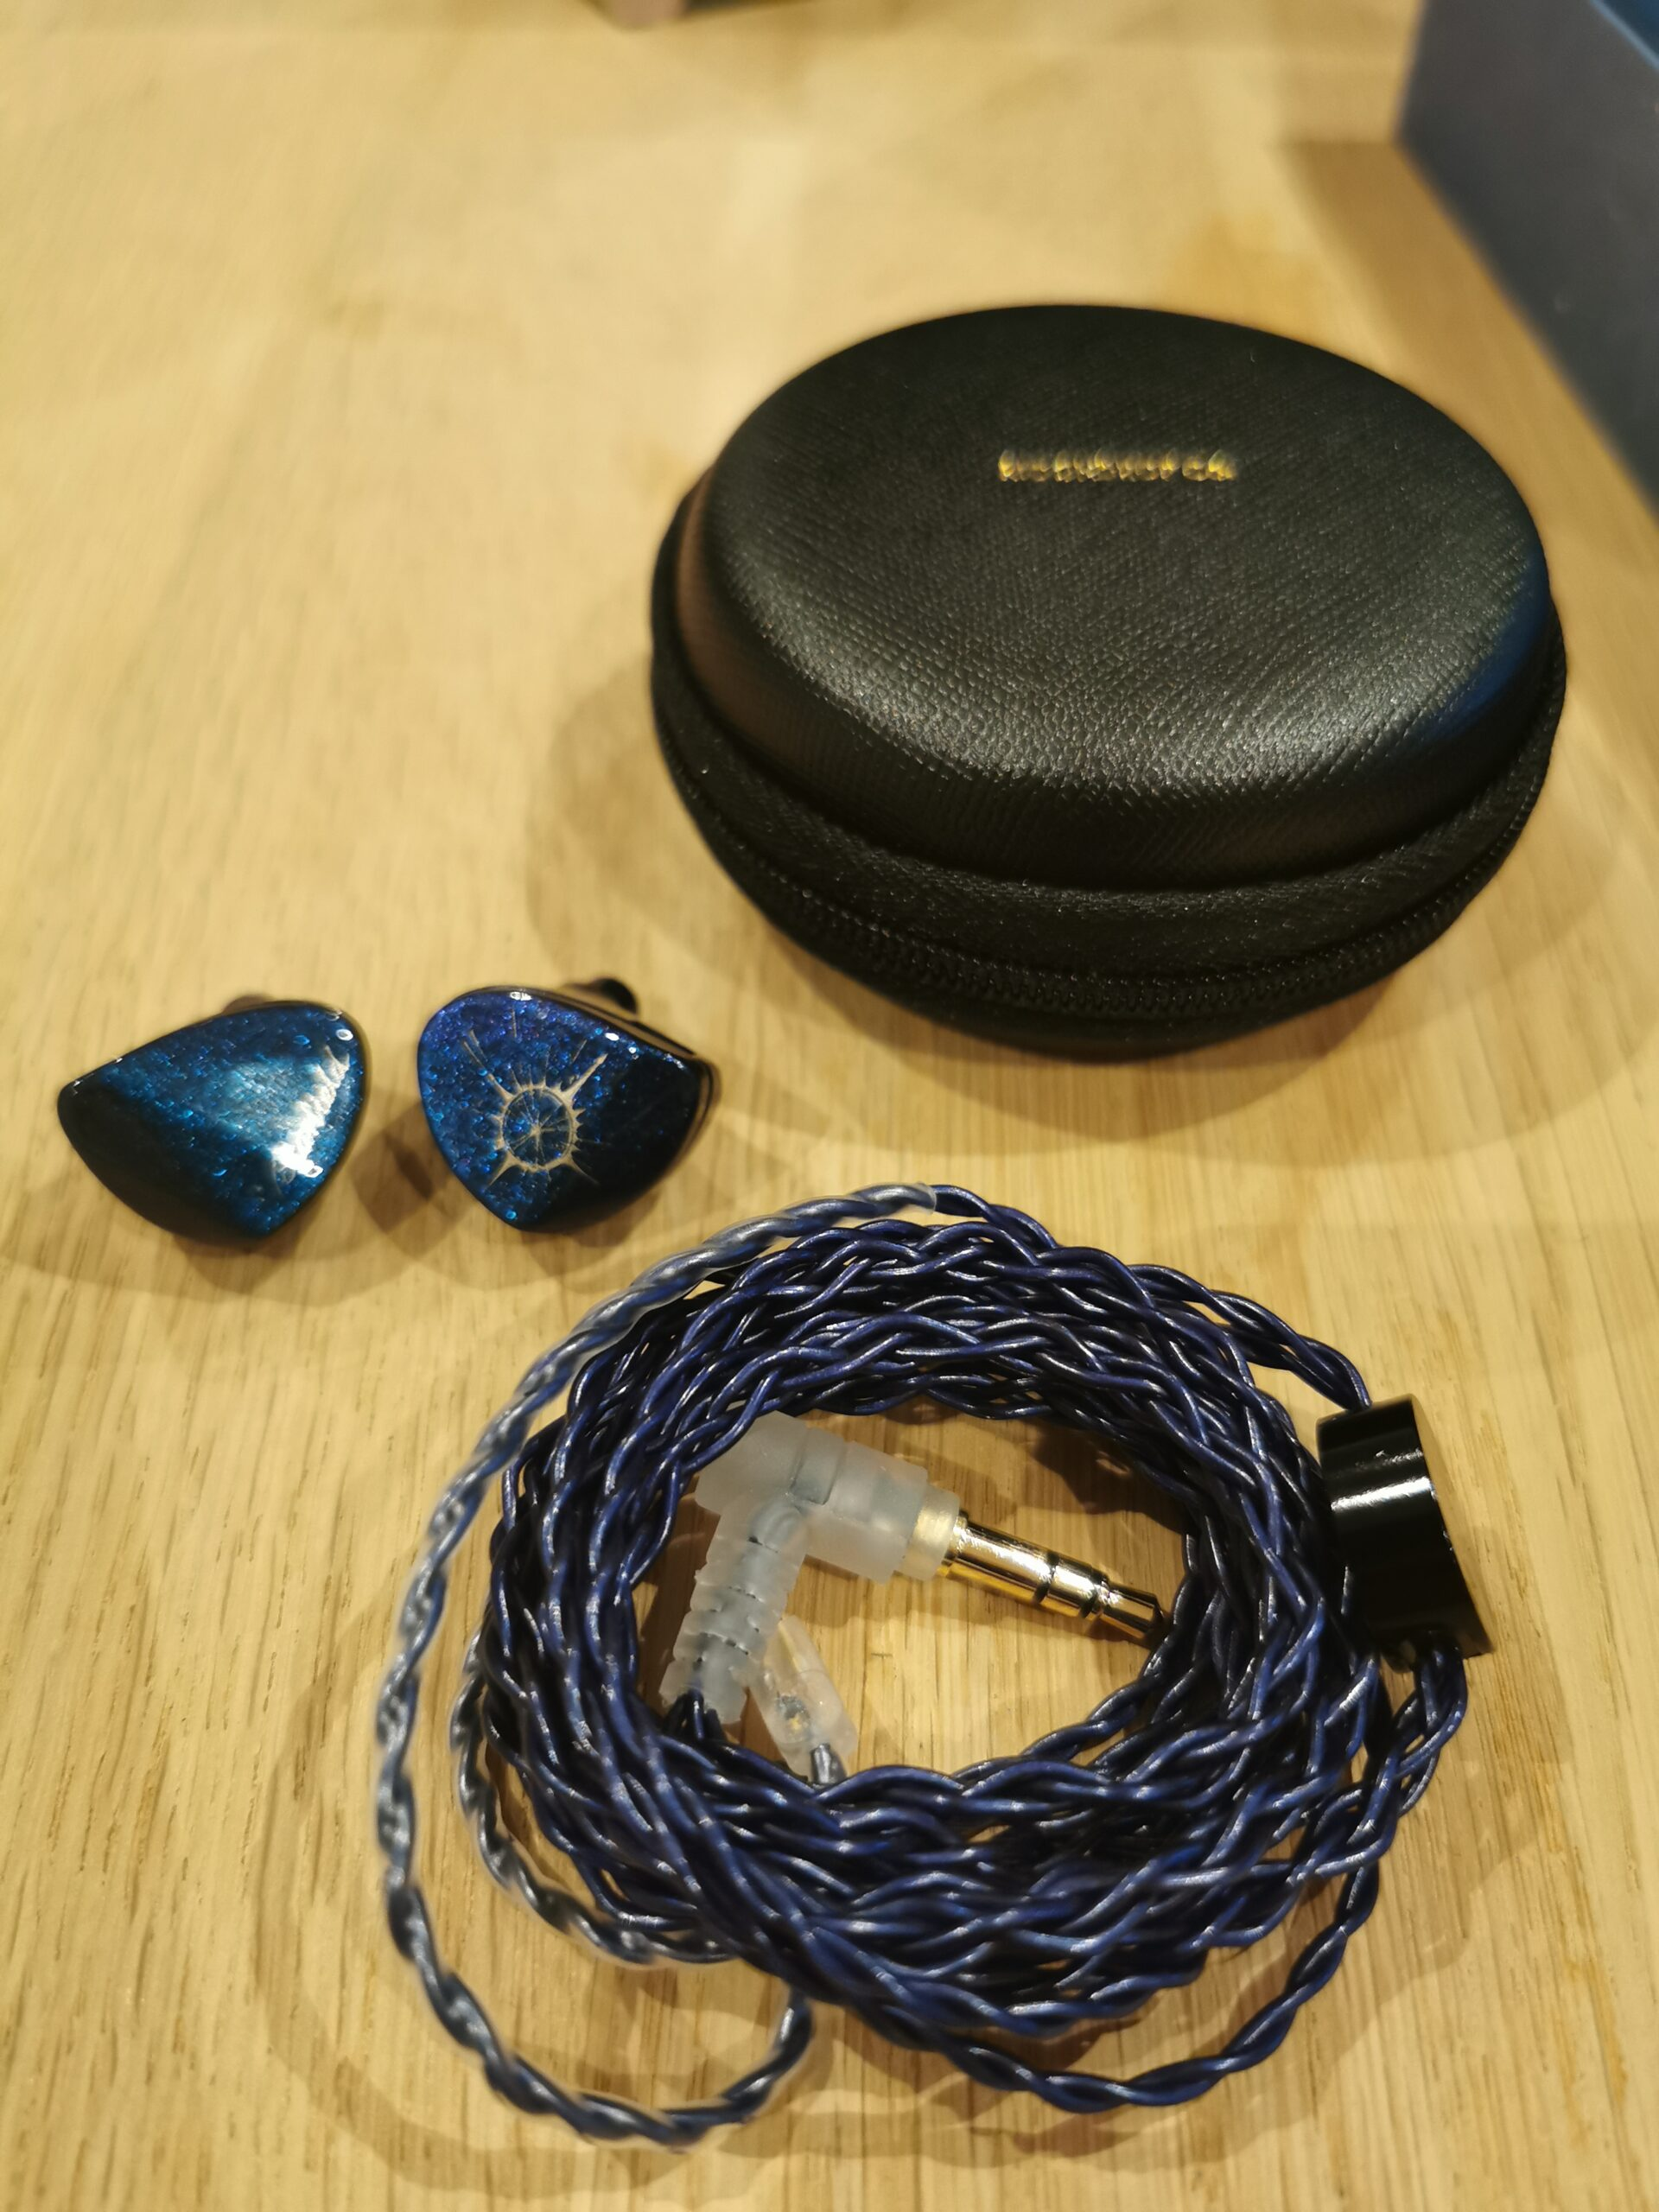 Moondrop Starfield in ear høretelefoner, kabel og etui